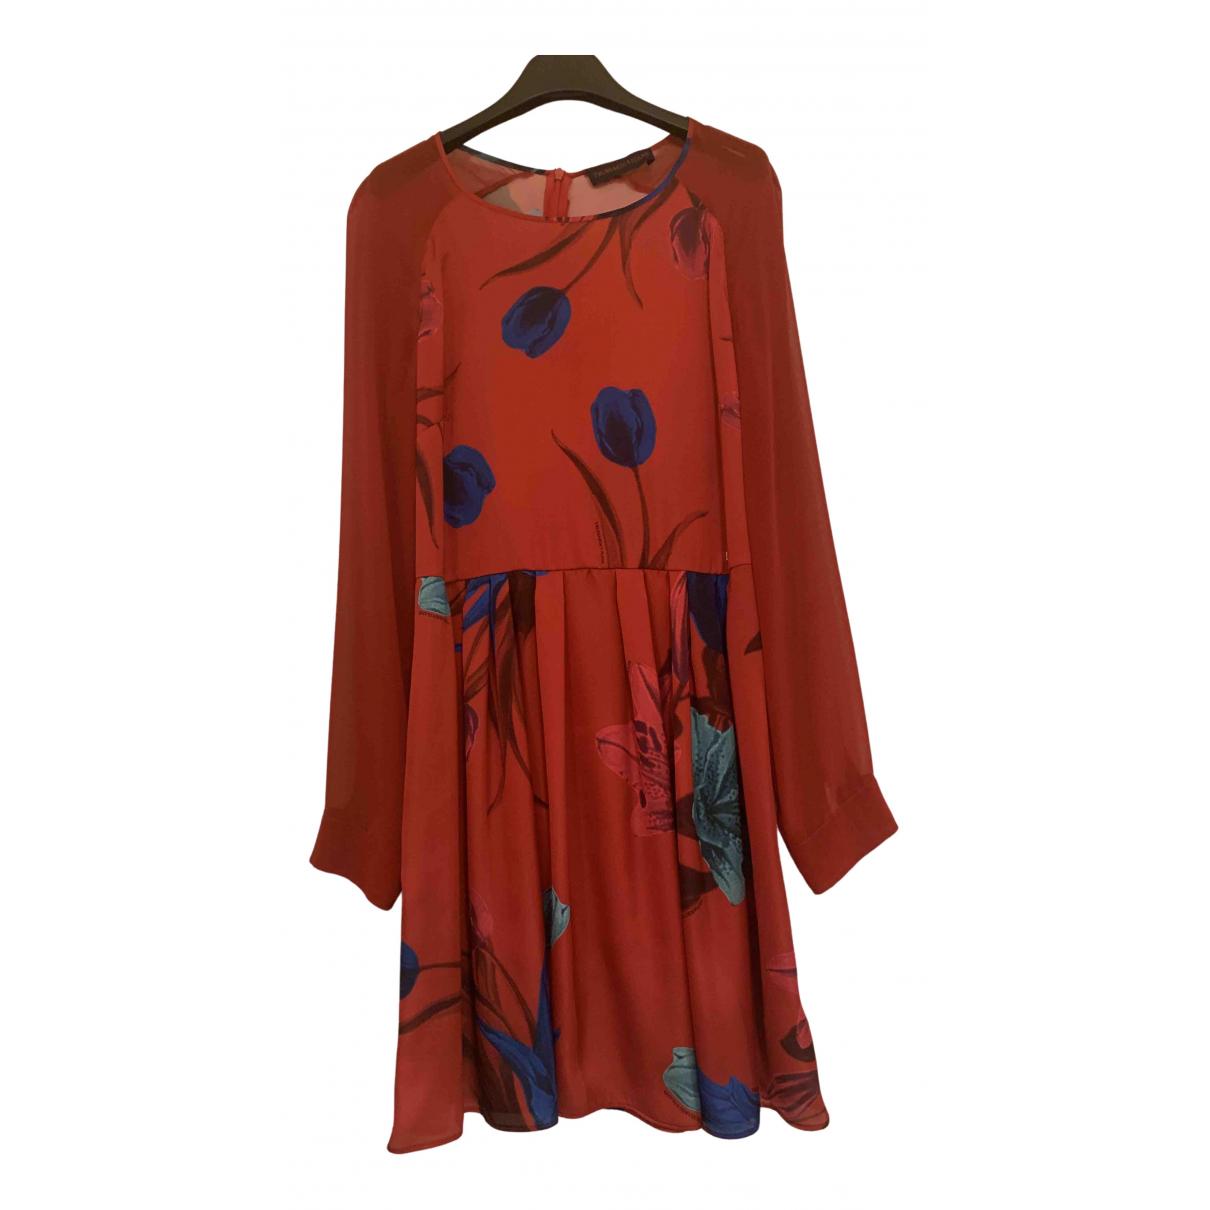 Trussardi Jeans \N Kleid in  Rot Polyester